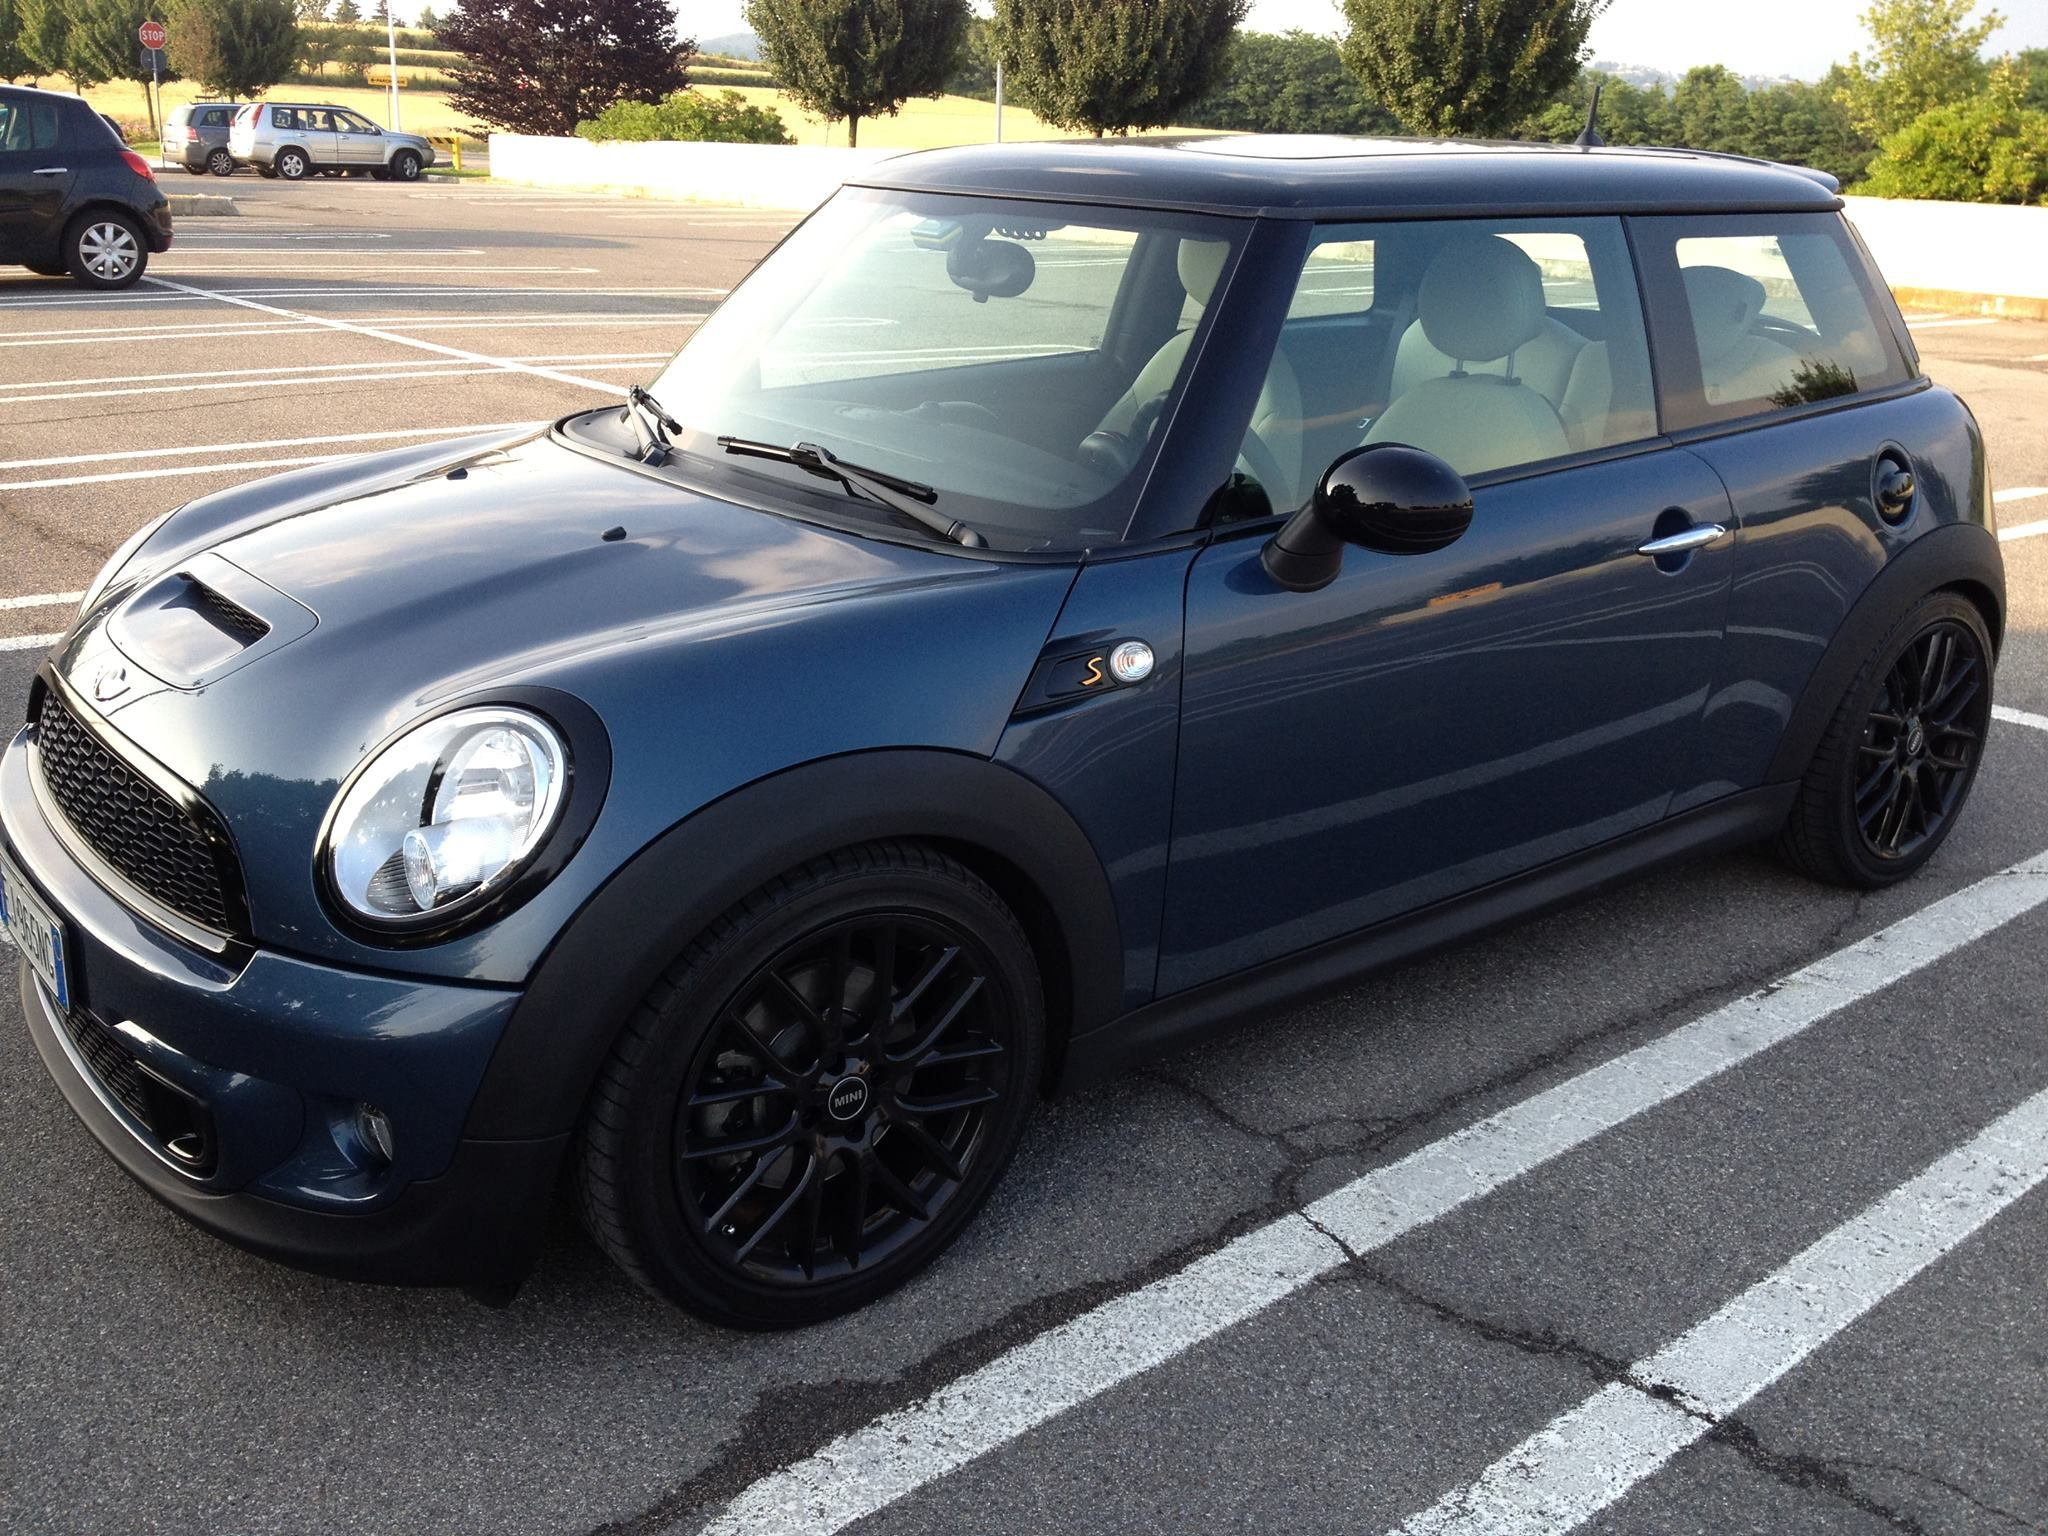 Mino Cooper S Dark Blue Elegant - Black Wheels